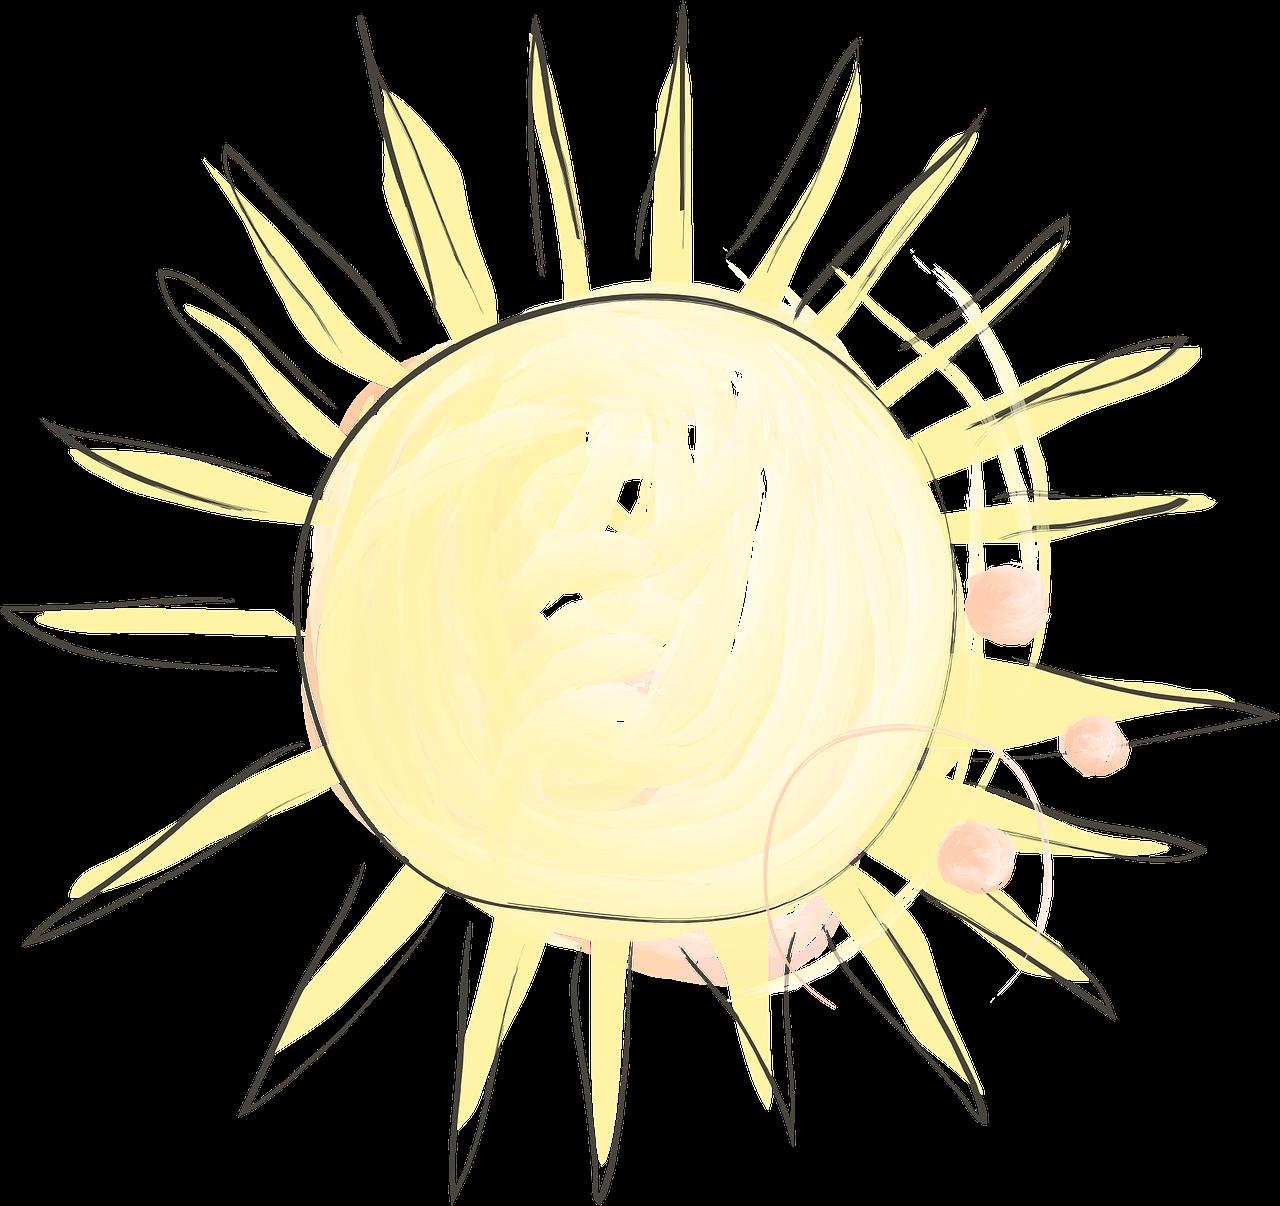 Sun Sunshine Day Summer Sunny Transparent Image Image Free Images Free Prints